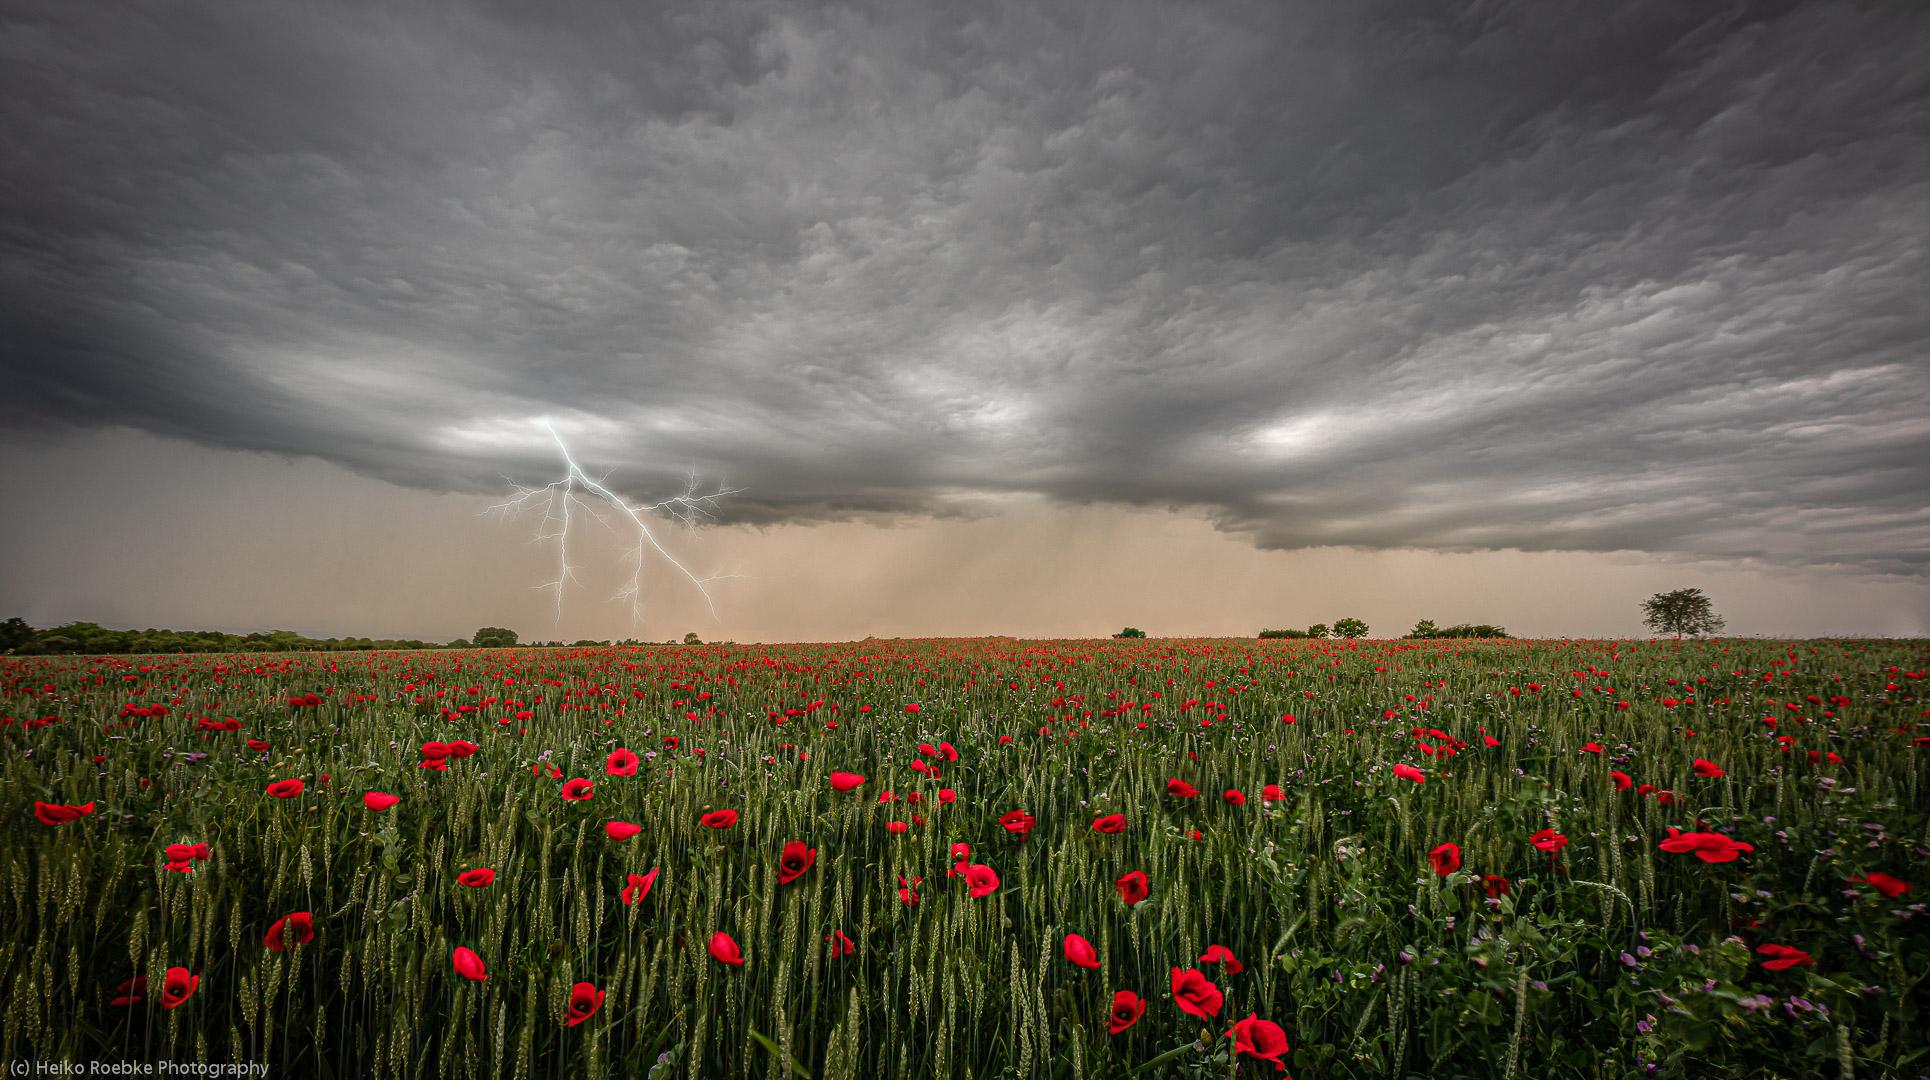 Sommergewitter / summer thunderstorm